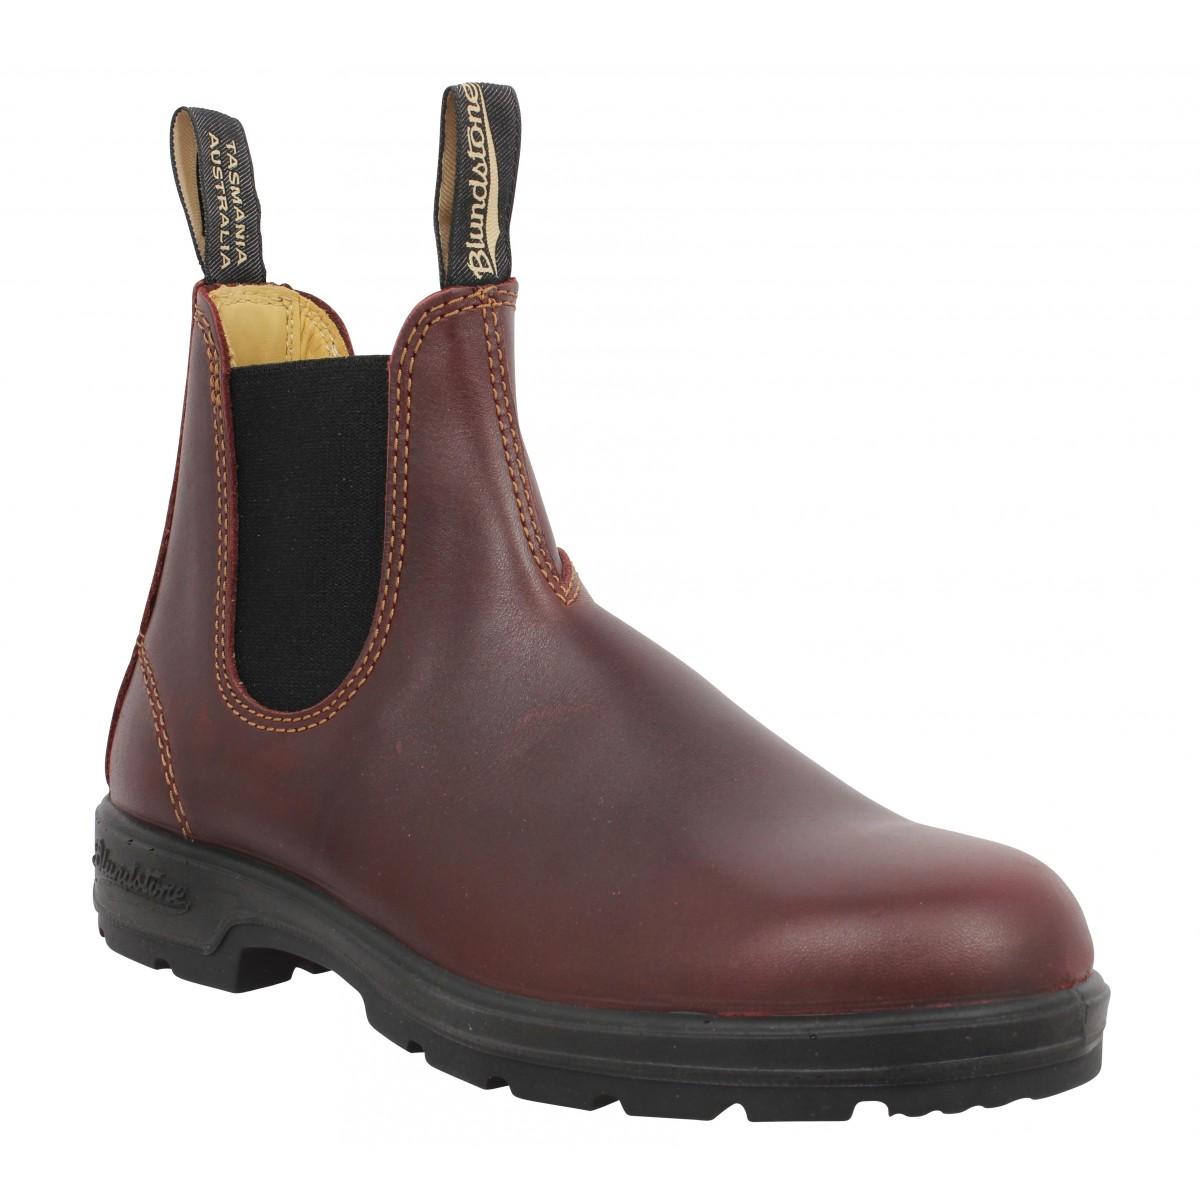 Bottines BLUNDSTONE Boots Comfort 1440 cuir Femme Marron